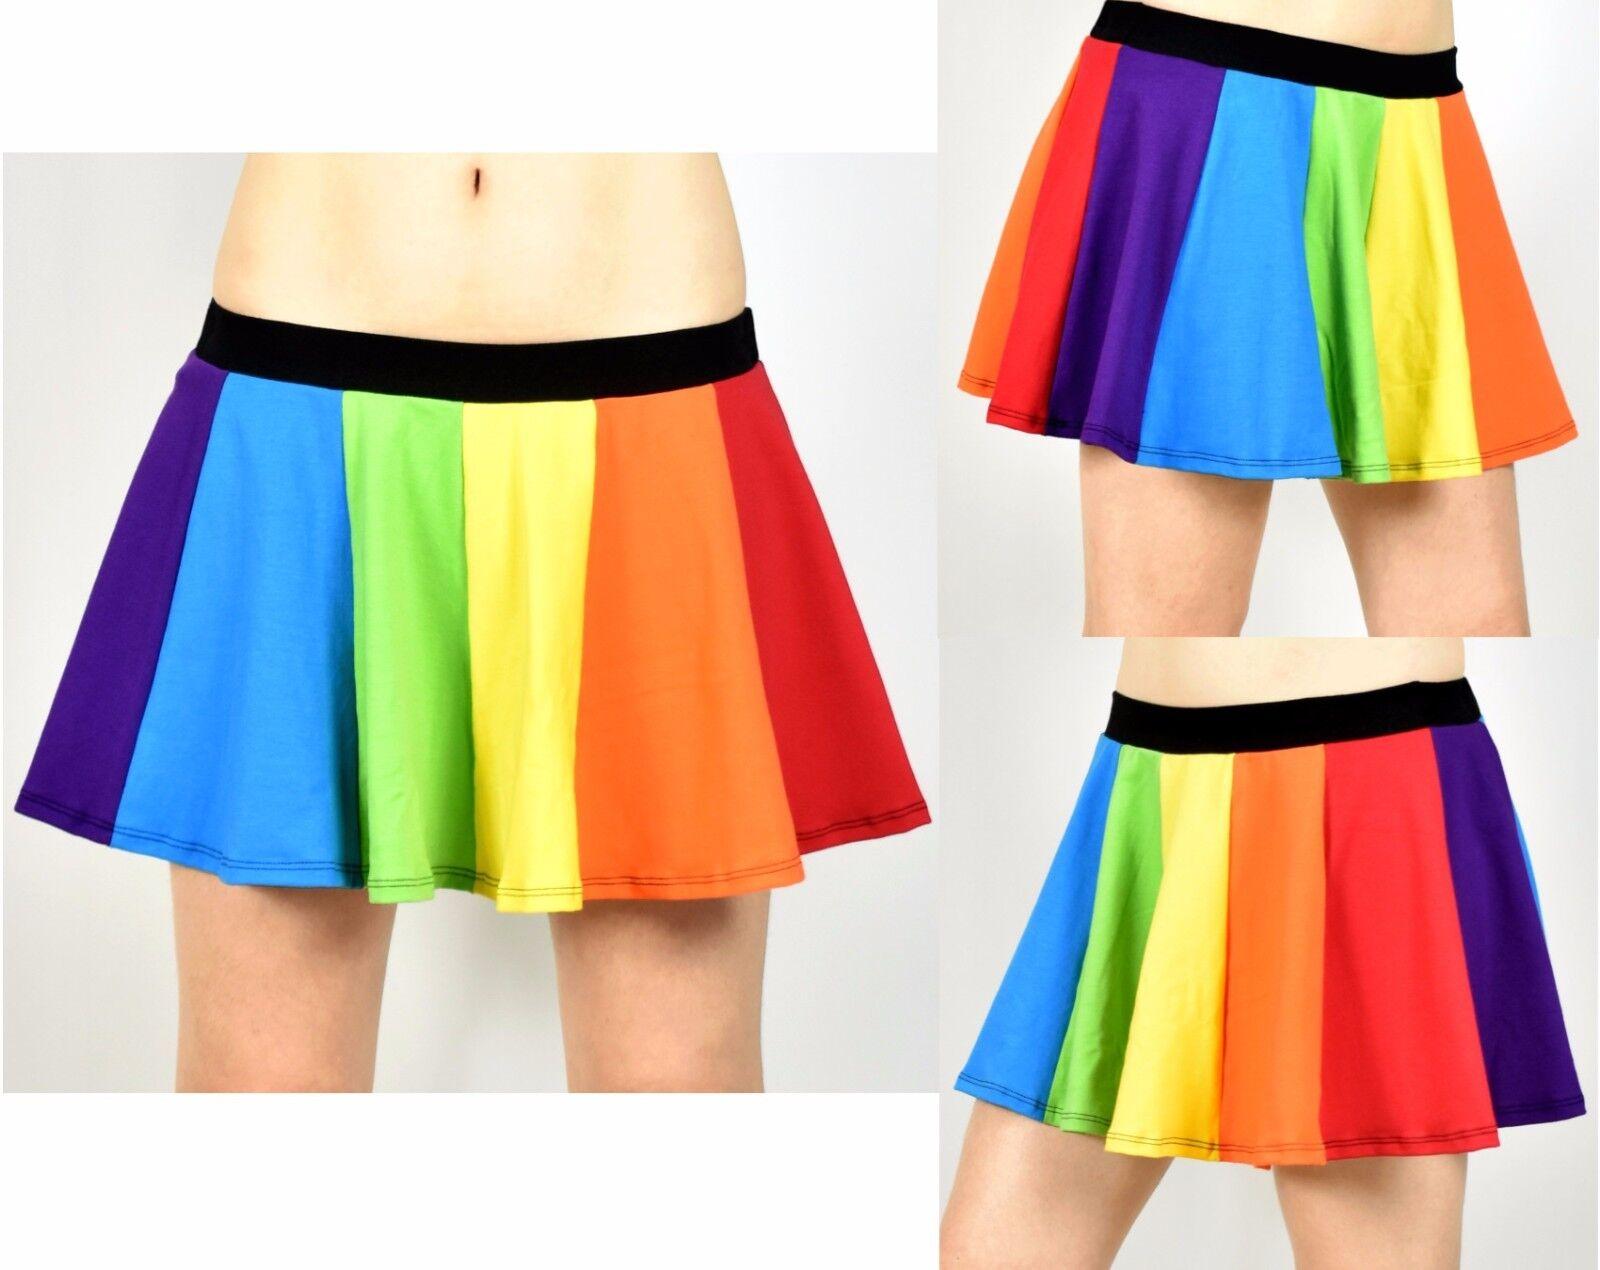 Rainbow Circle Skirt cotton spandex mini XS S M L XL 2XL 3XL plus size stretch